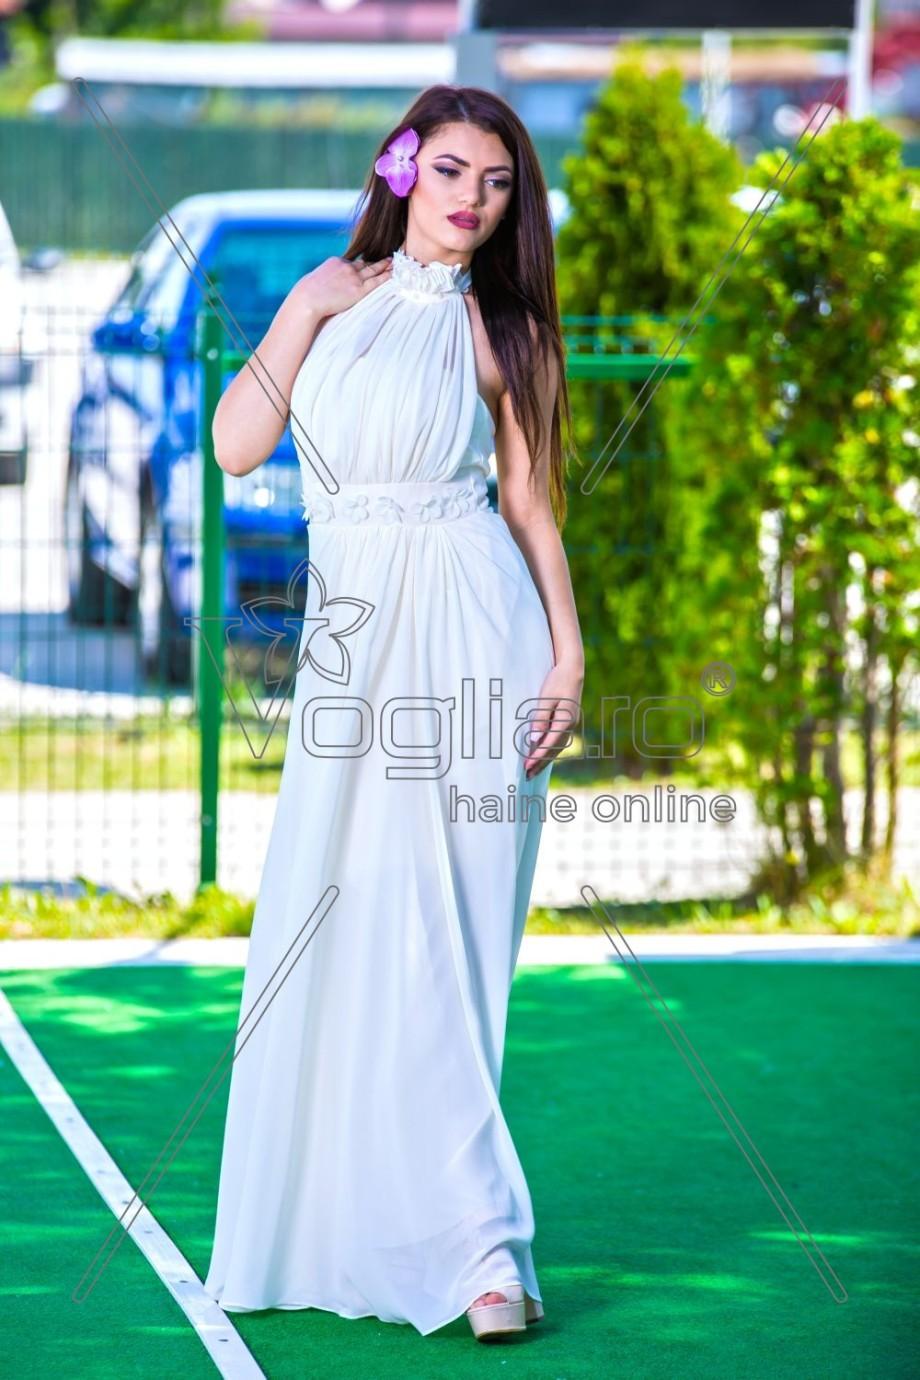 rochie-din-voal-crem-cu-perle-la-gat-1501744070-4